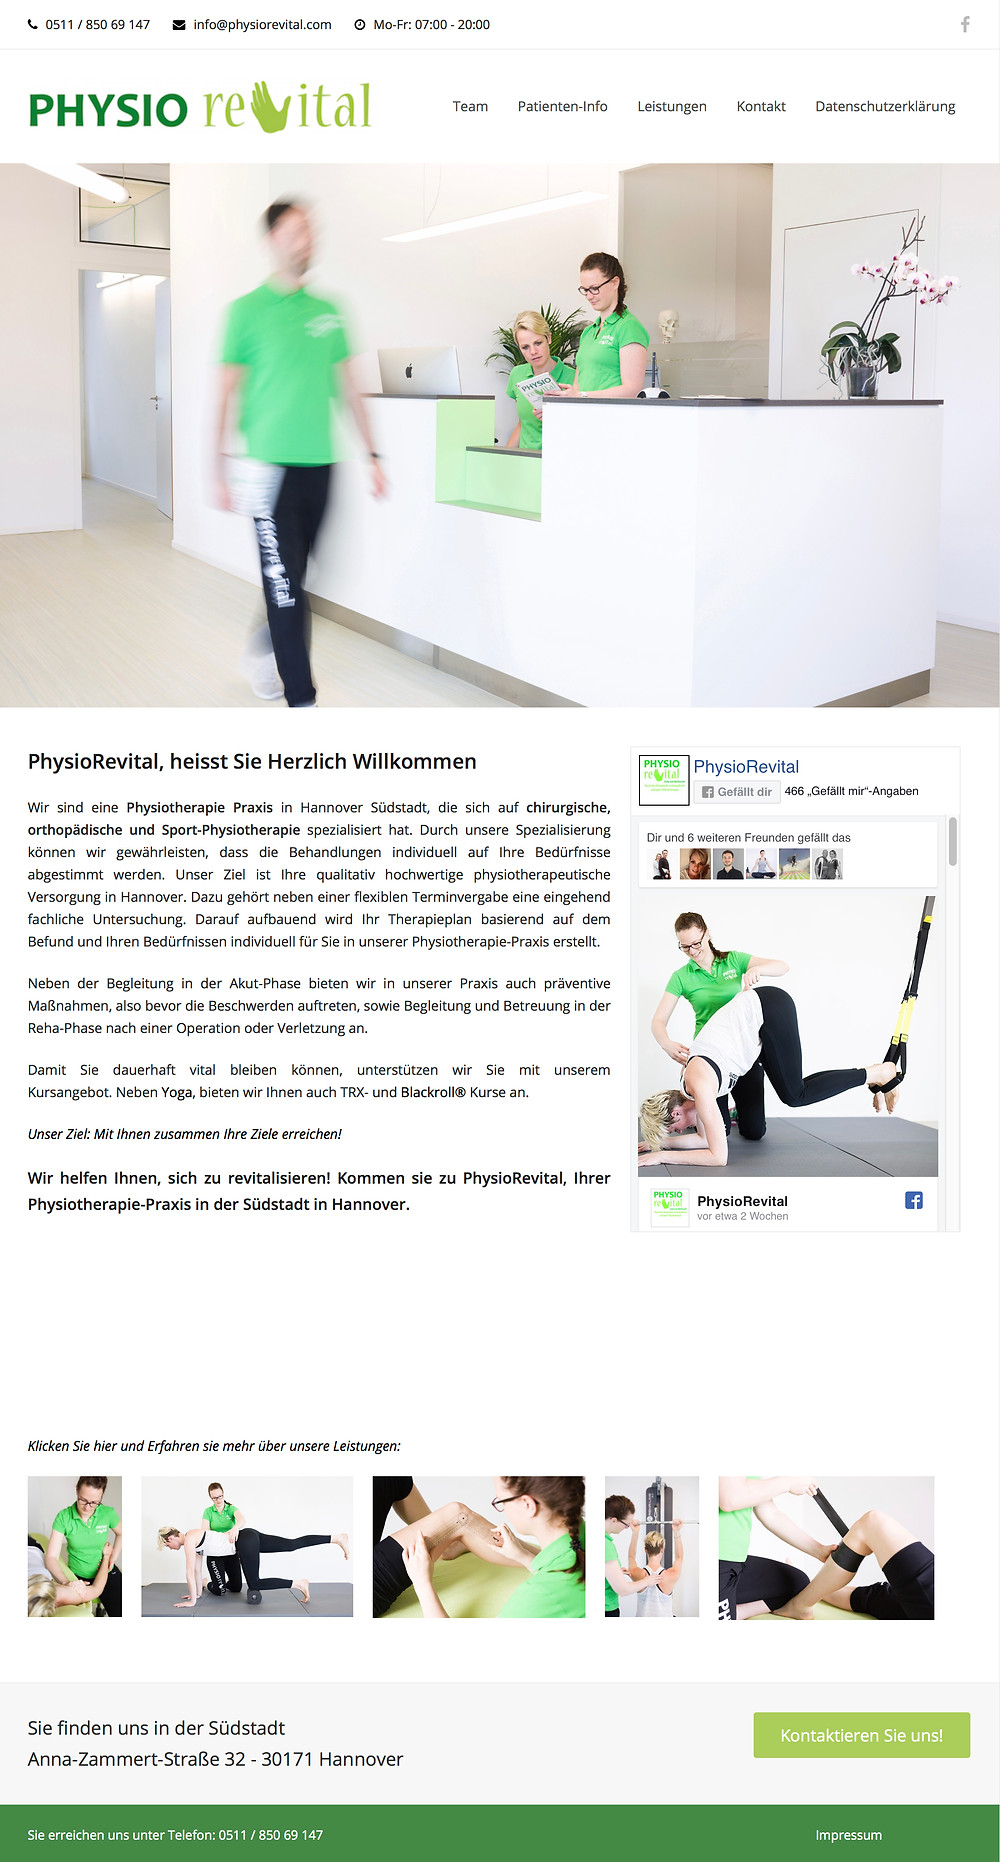 PhysioRevital